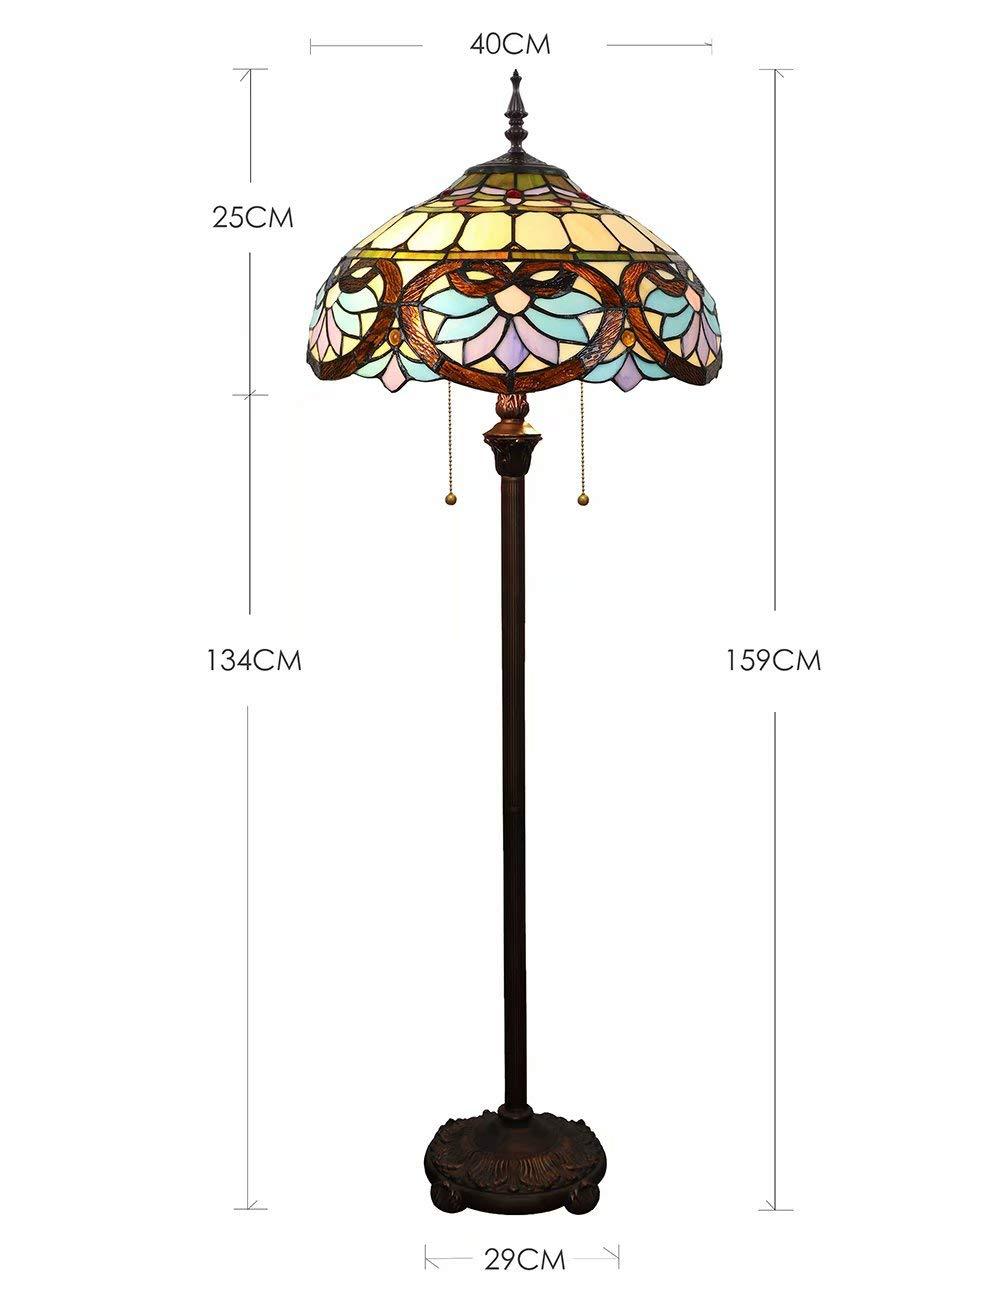 de Lámparas pulgadas de 16 interior Iluminación estilo CxedBWro